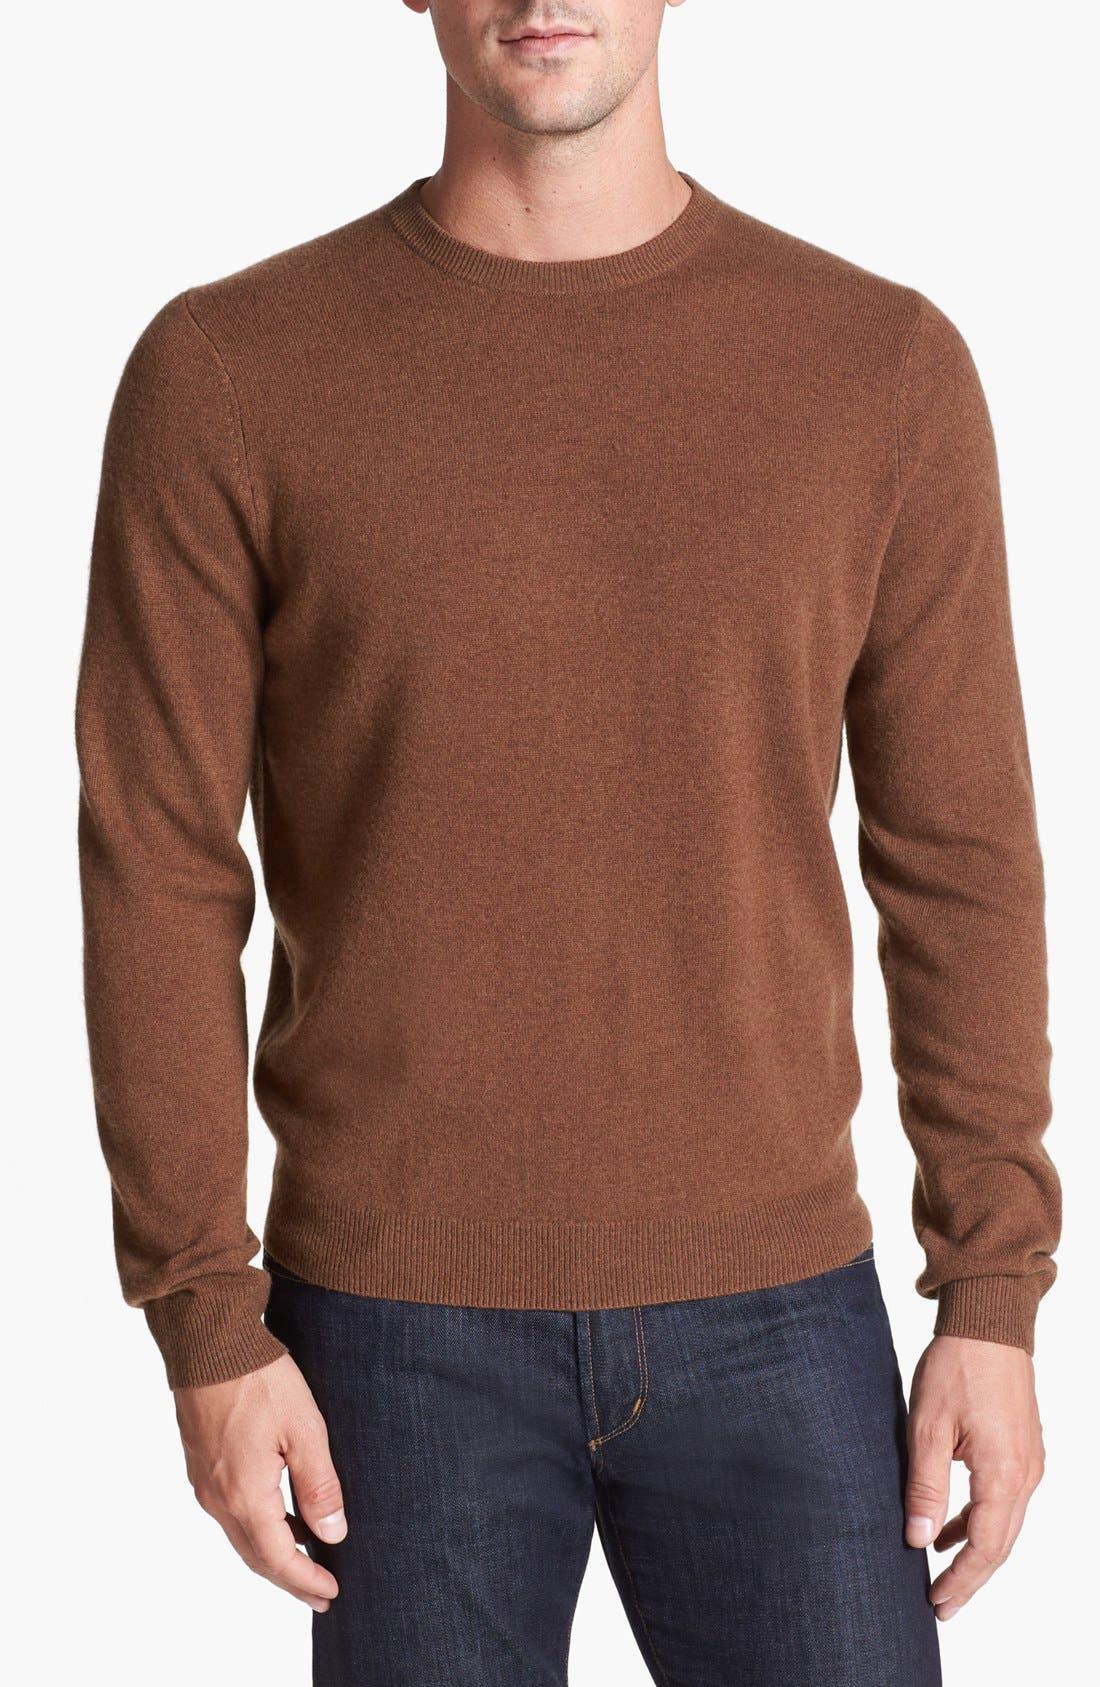 Main Image - Nordstrom Cashmere Crewneck Sweater